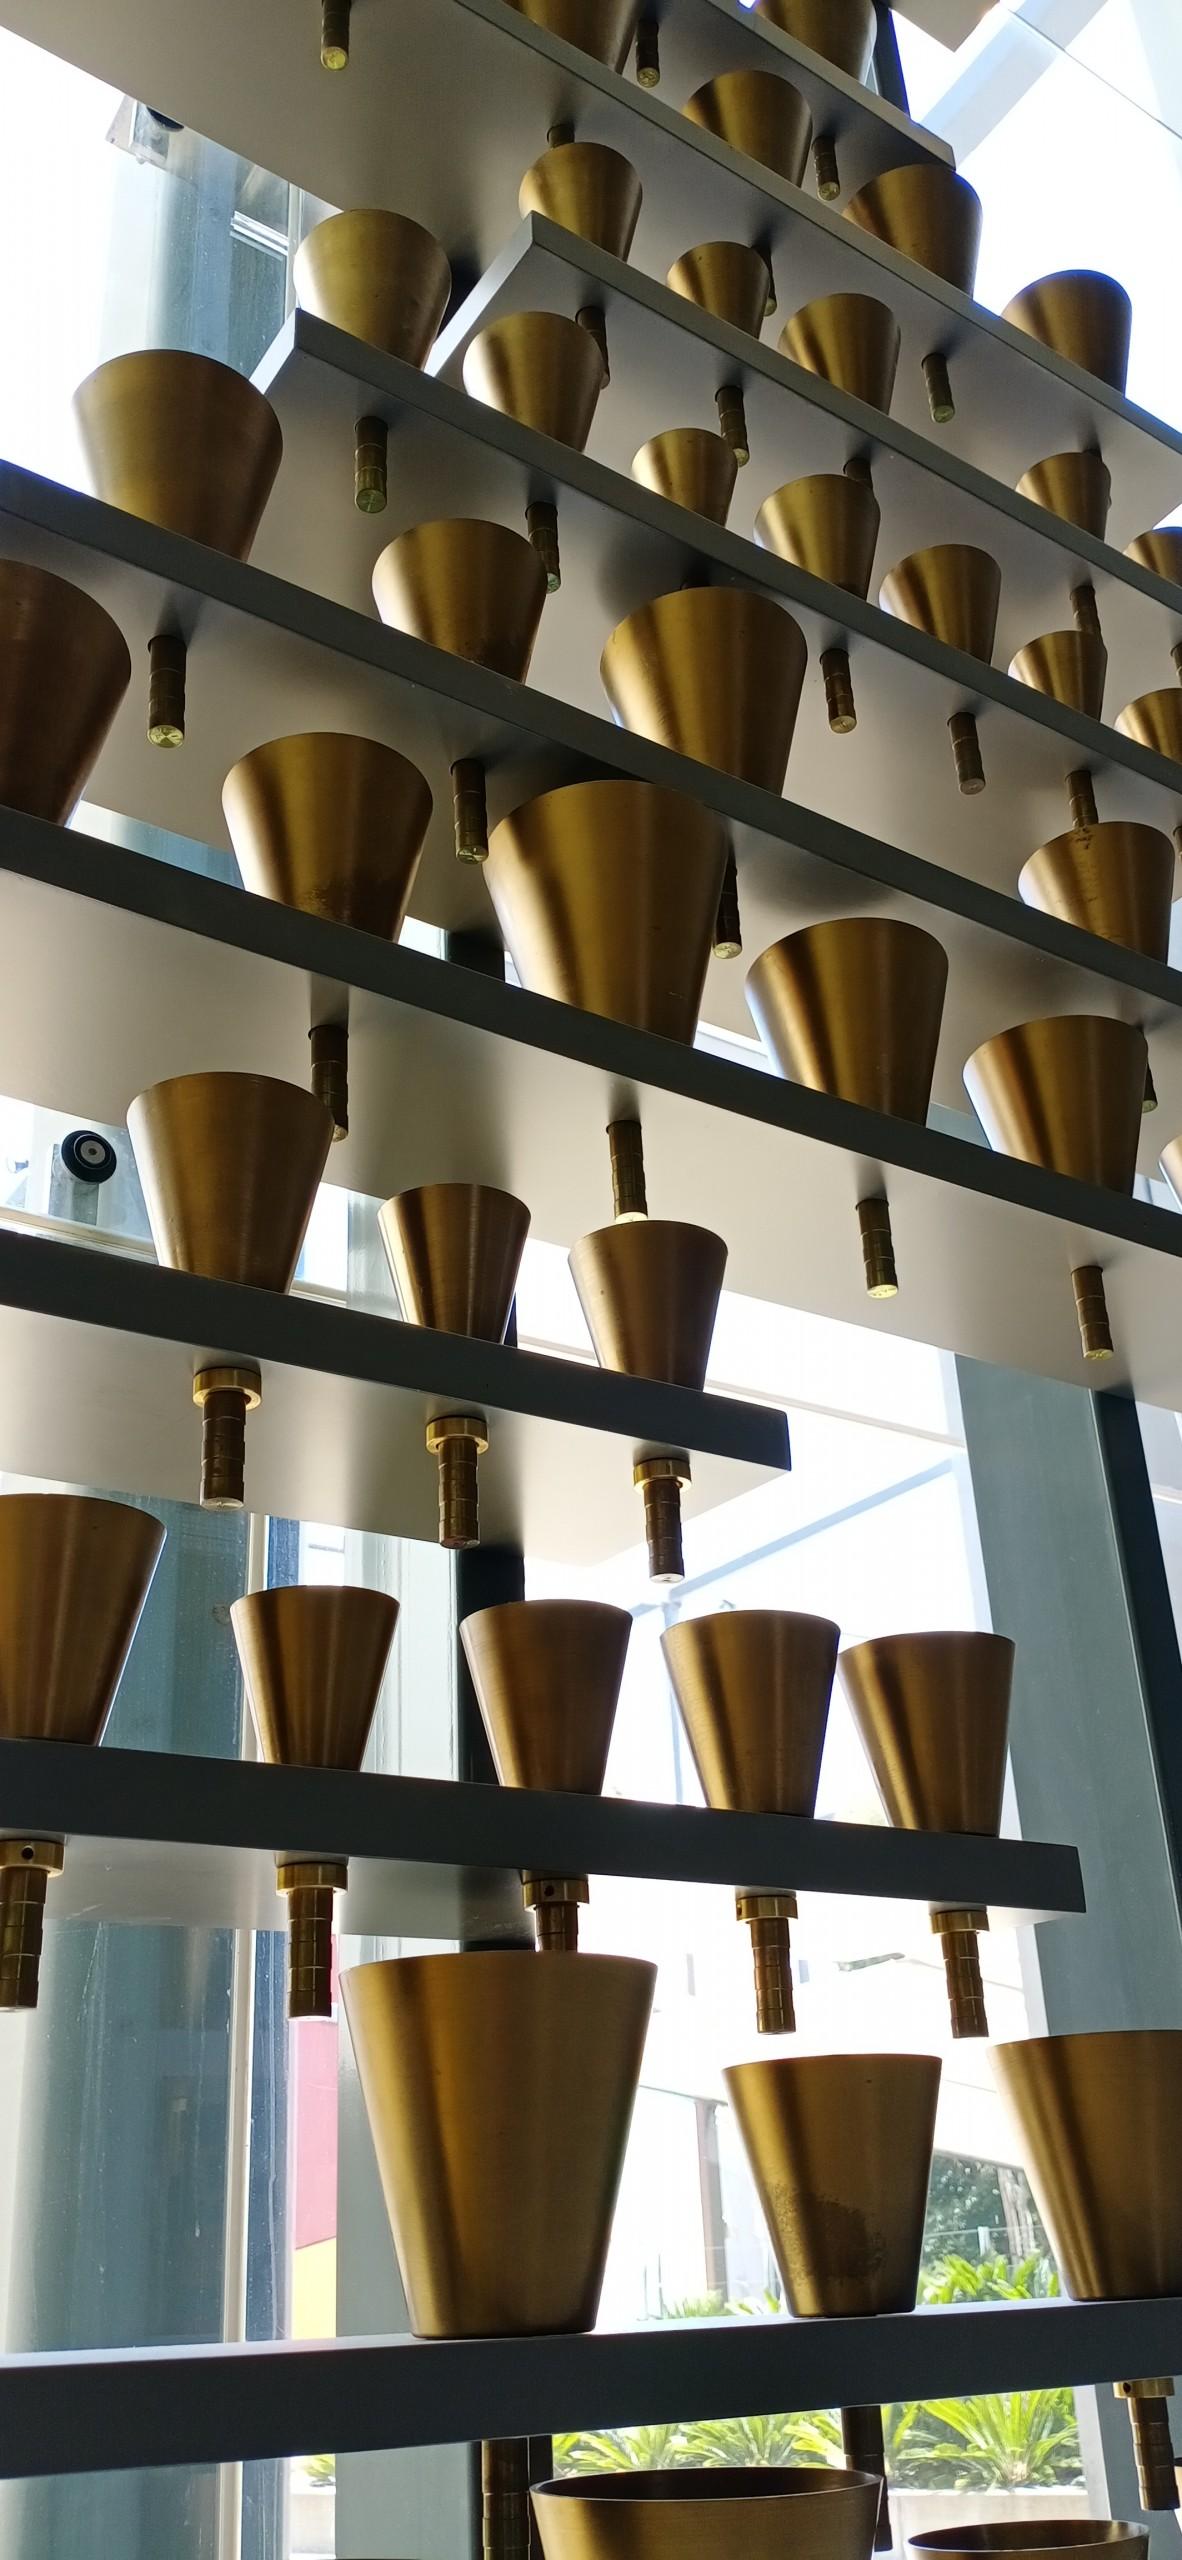 Centenary bells